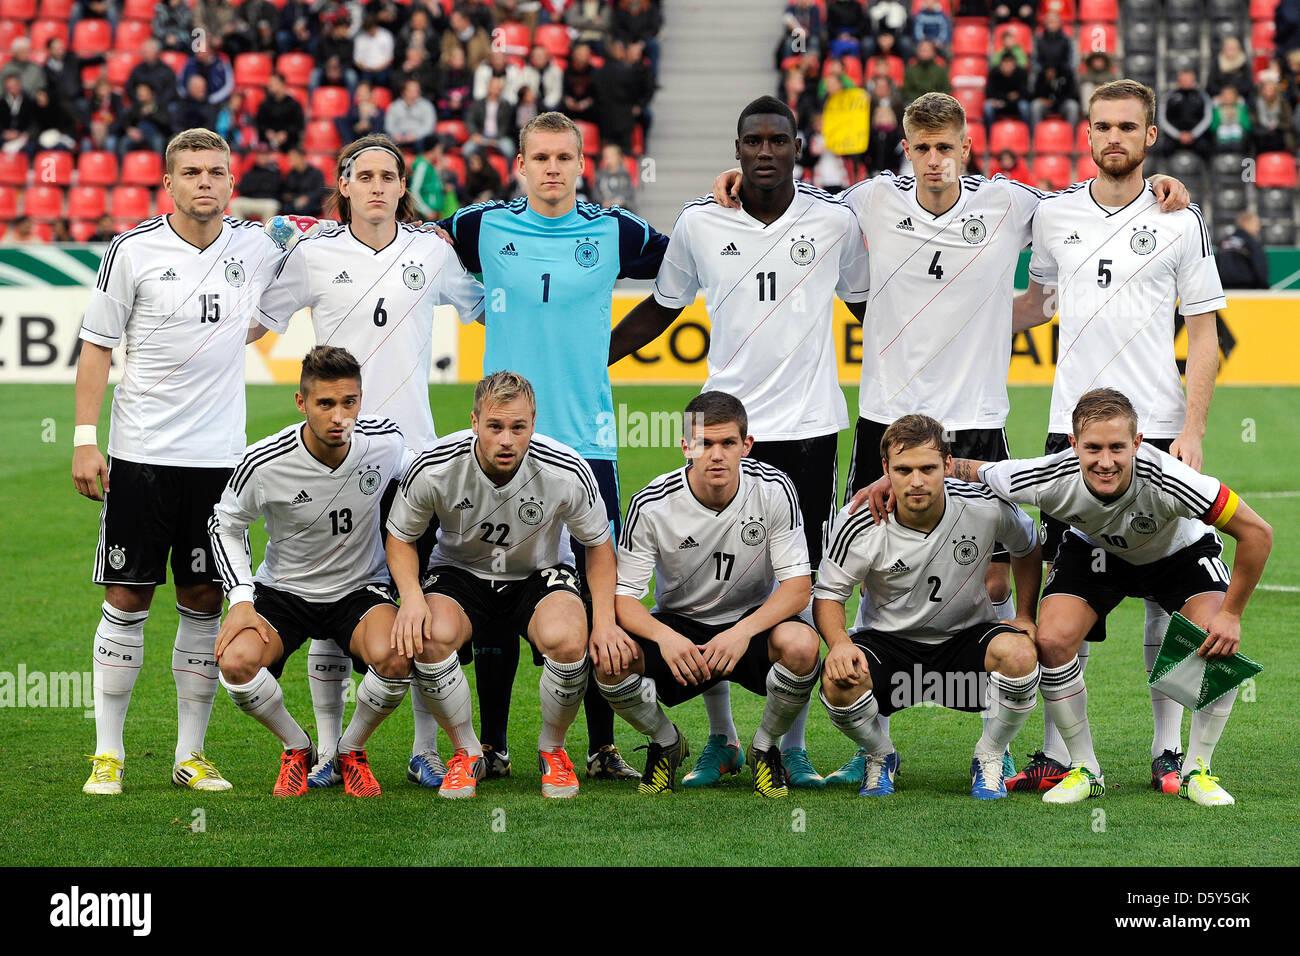 Germany's Alexander Esswein (TOPL-R), Sebastian Rudy, Bernd Leno, Peniel Mlapa, Lasse Sobiech, Sebastian - Stock Image